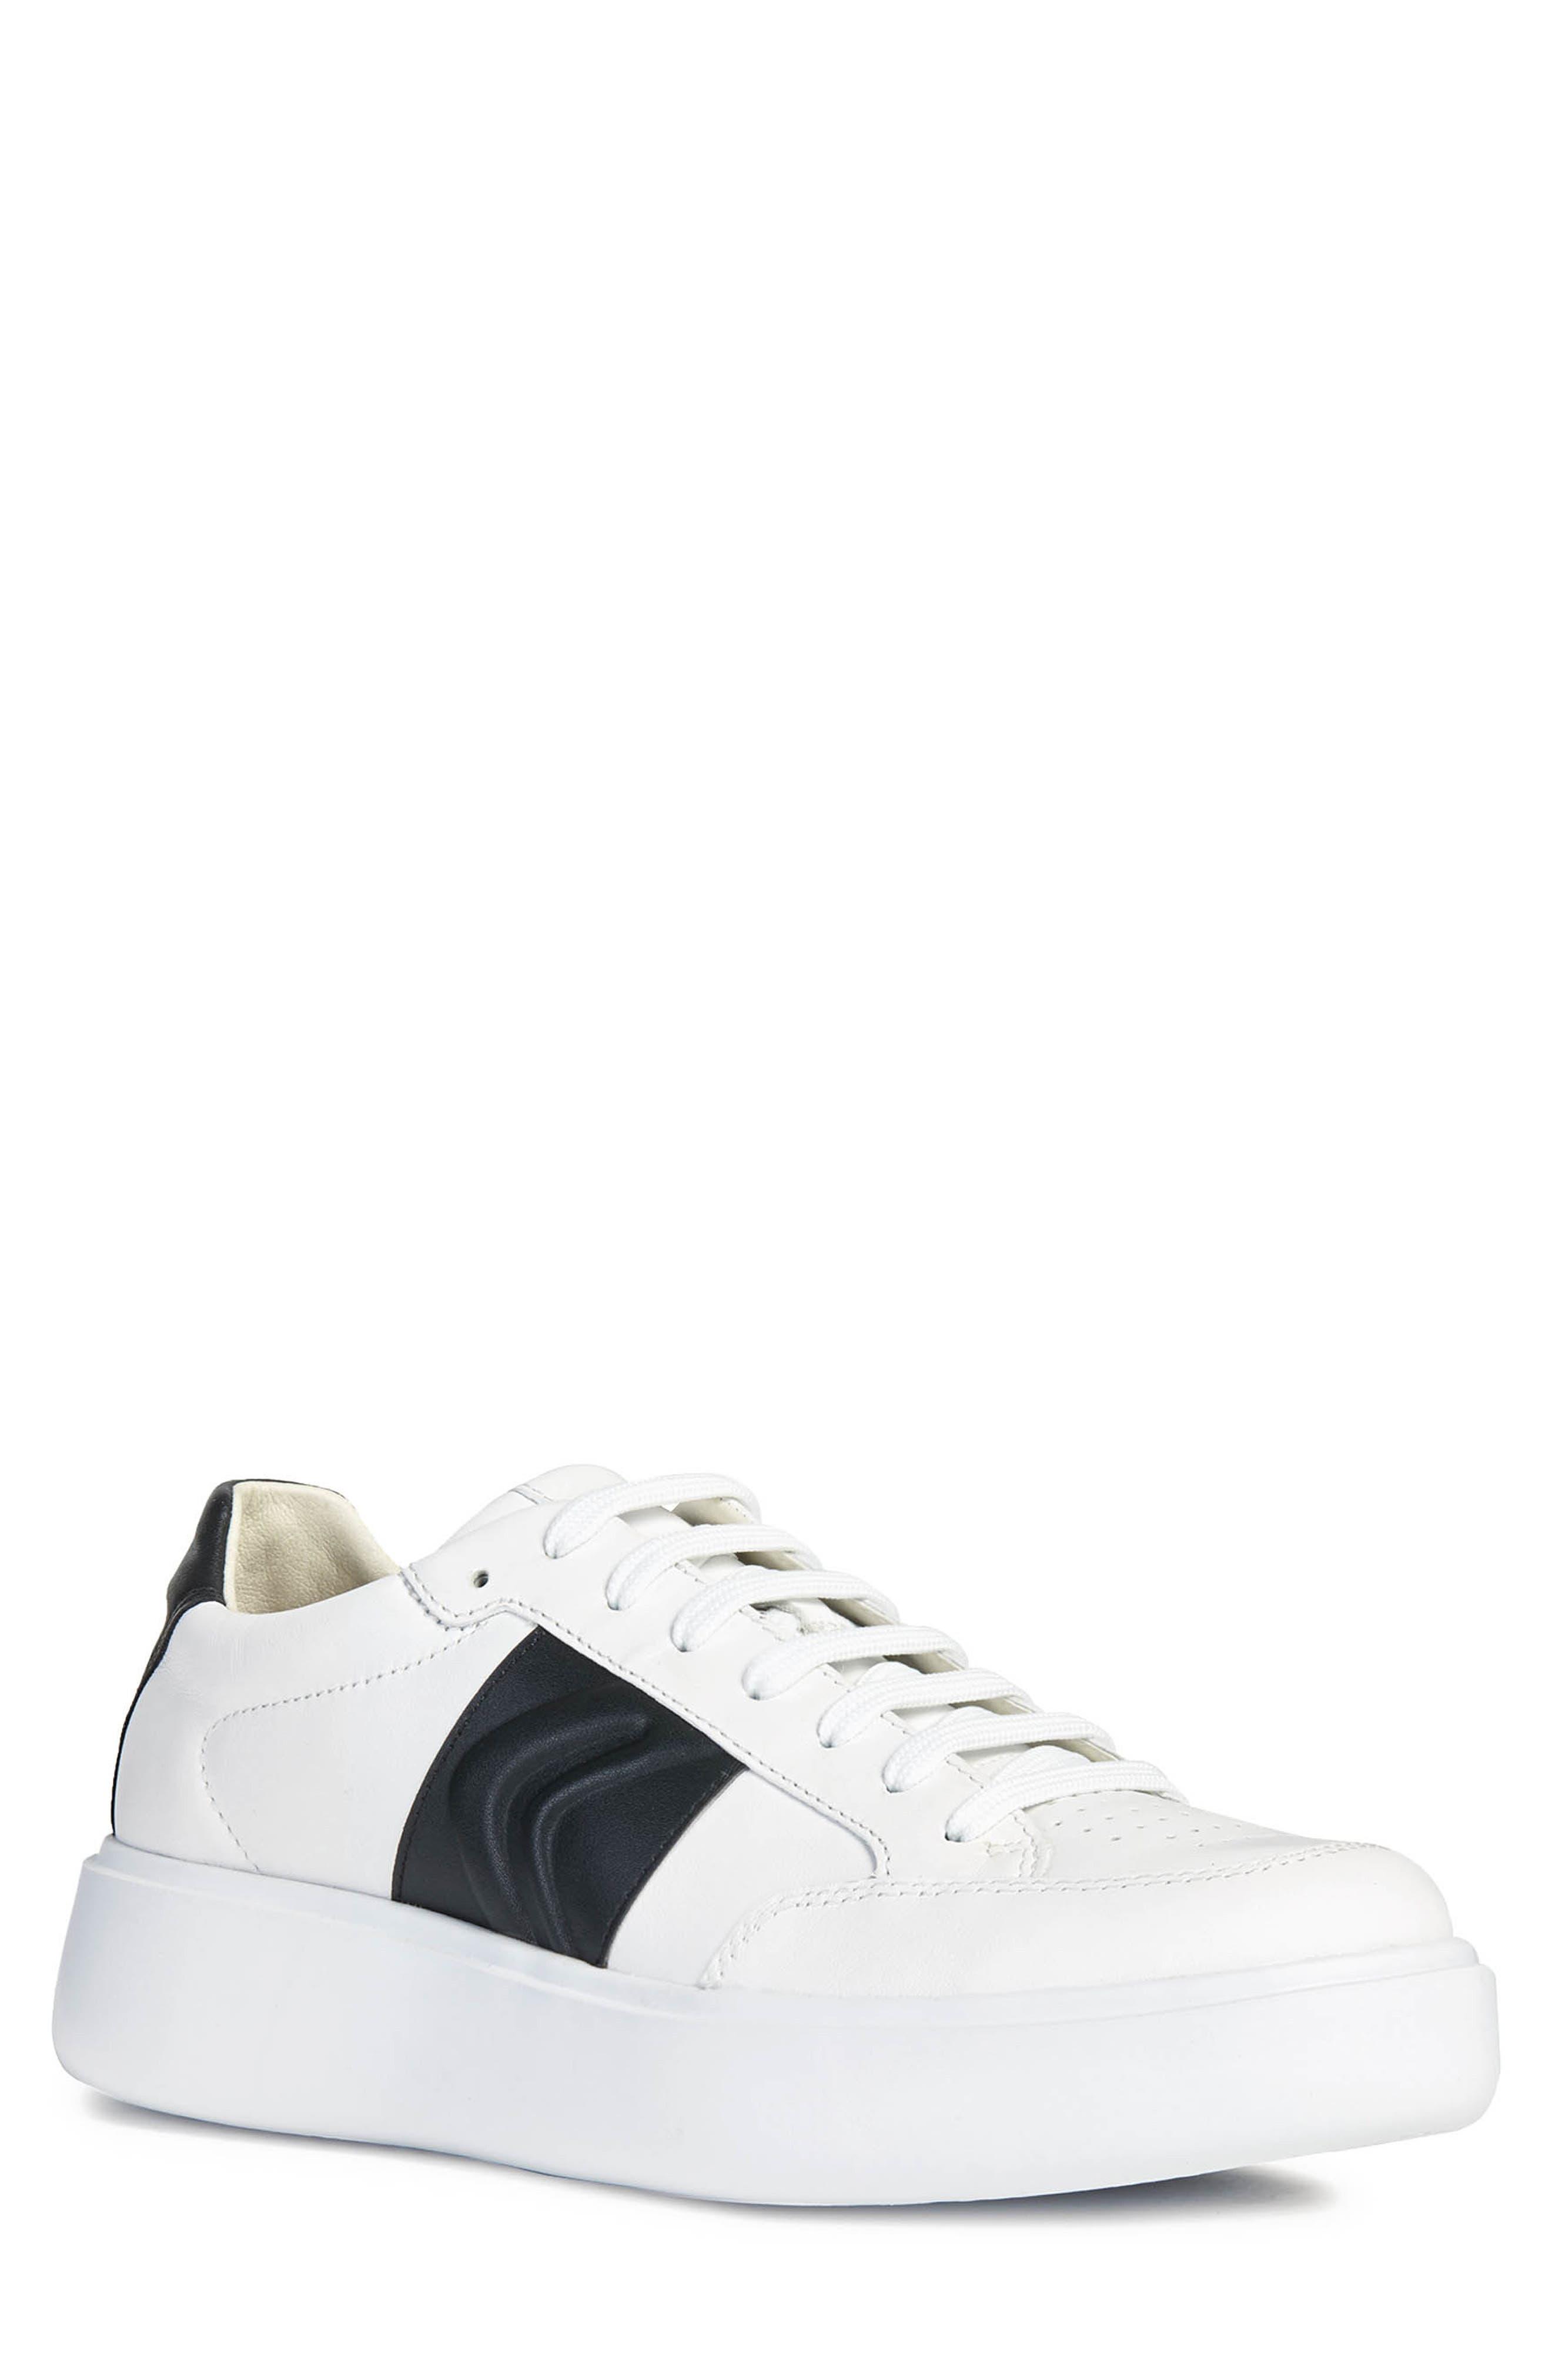 Geox Ottaya 1 Sneaker, US / 44EU - White